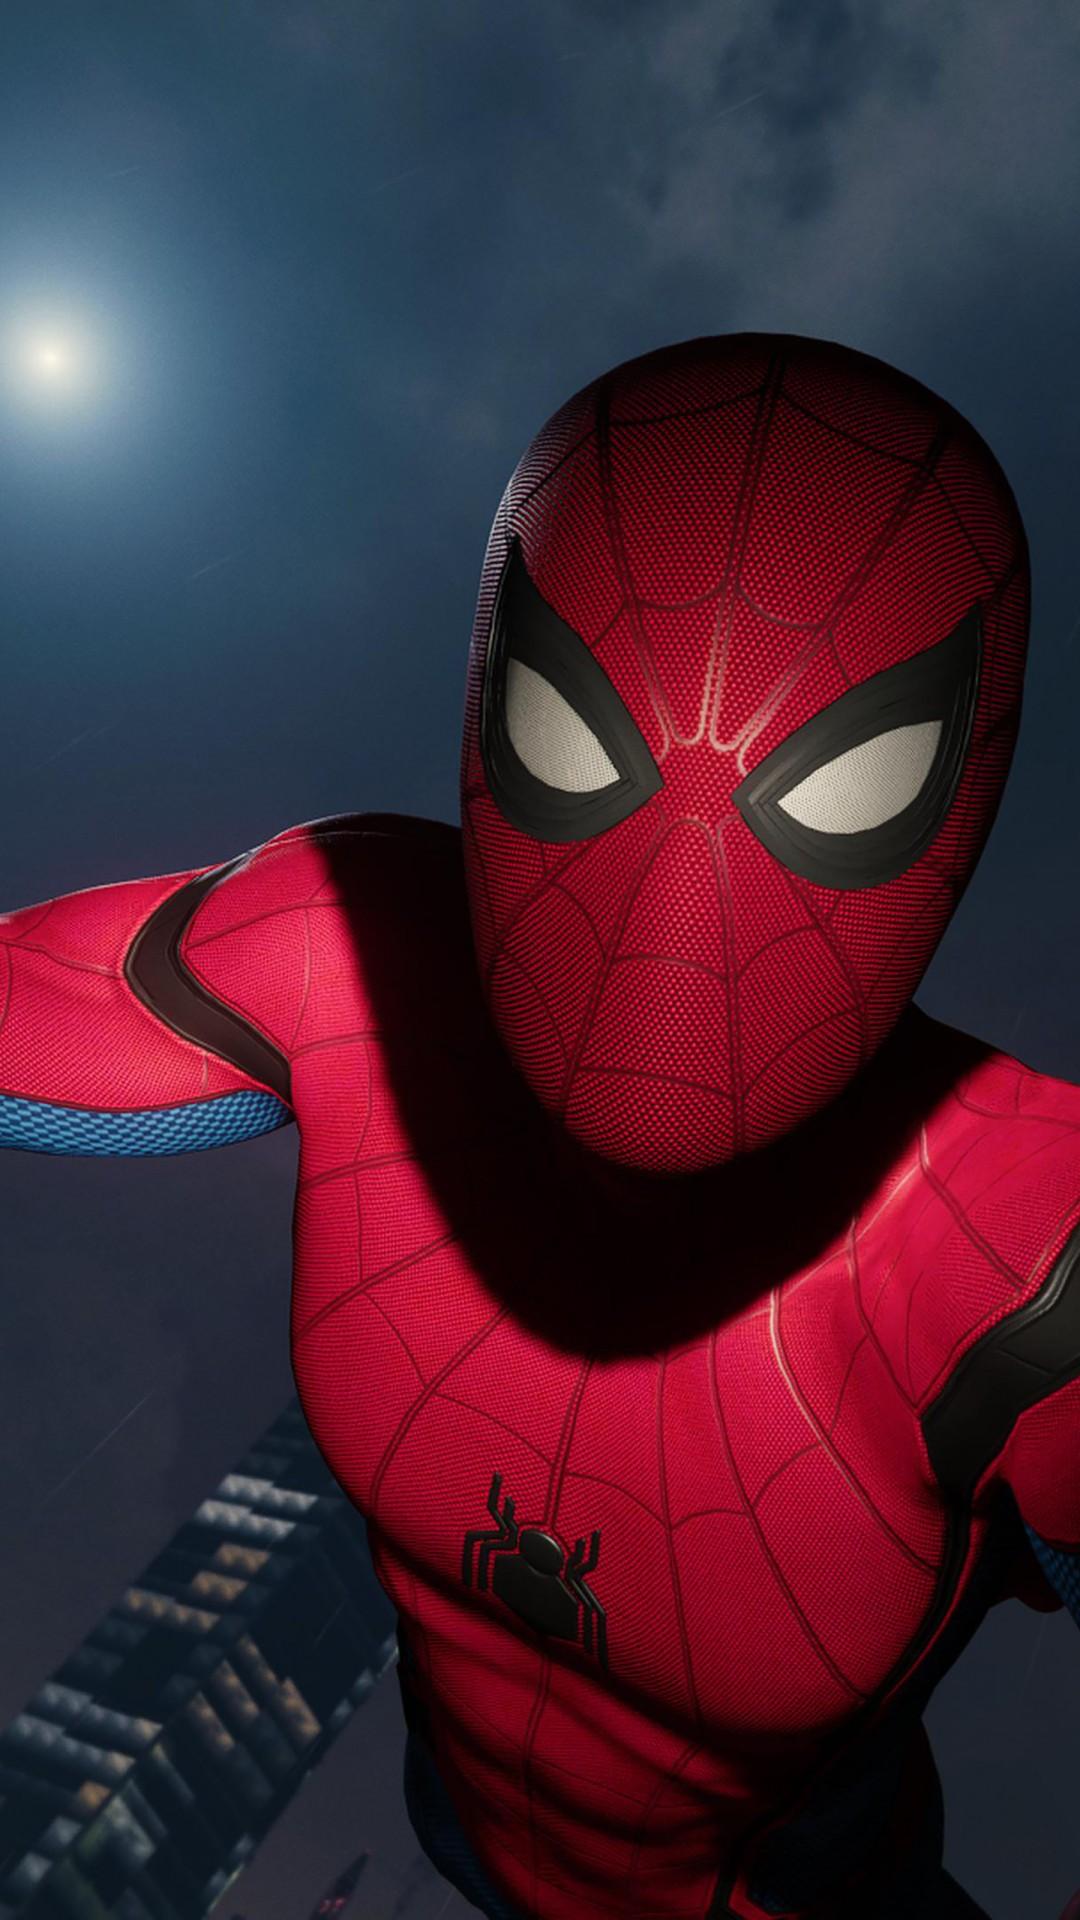 Mortal Kombat X Wallpapers Hd Iphone Spider Man Selfie 4k Wallpapers Hd Wallpapers Id 27008